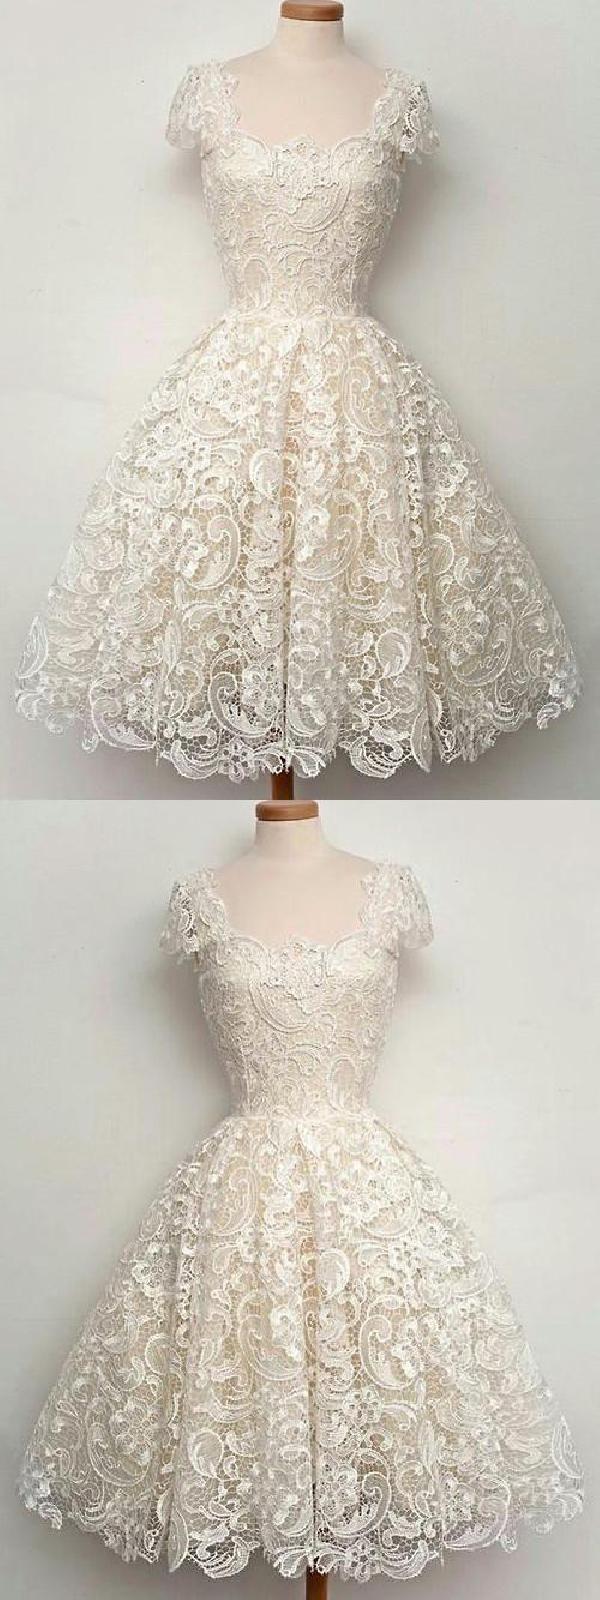 Homecoming dress short homecoming dress lace ivory prom dress